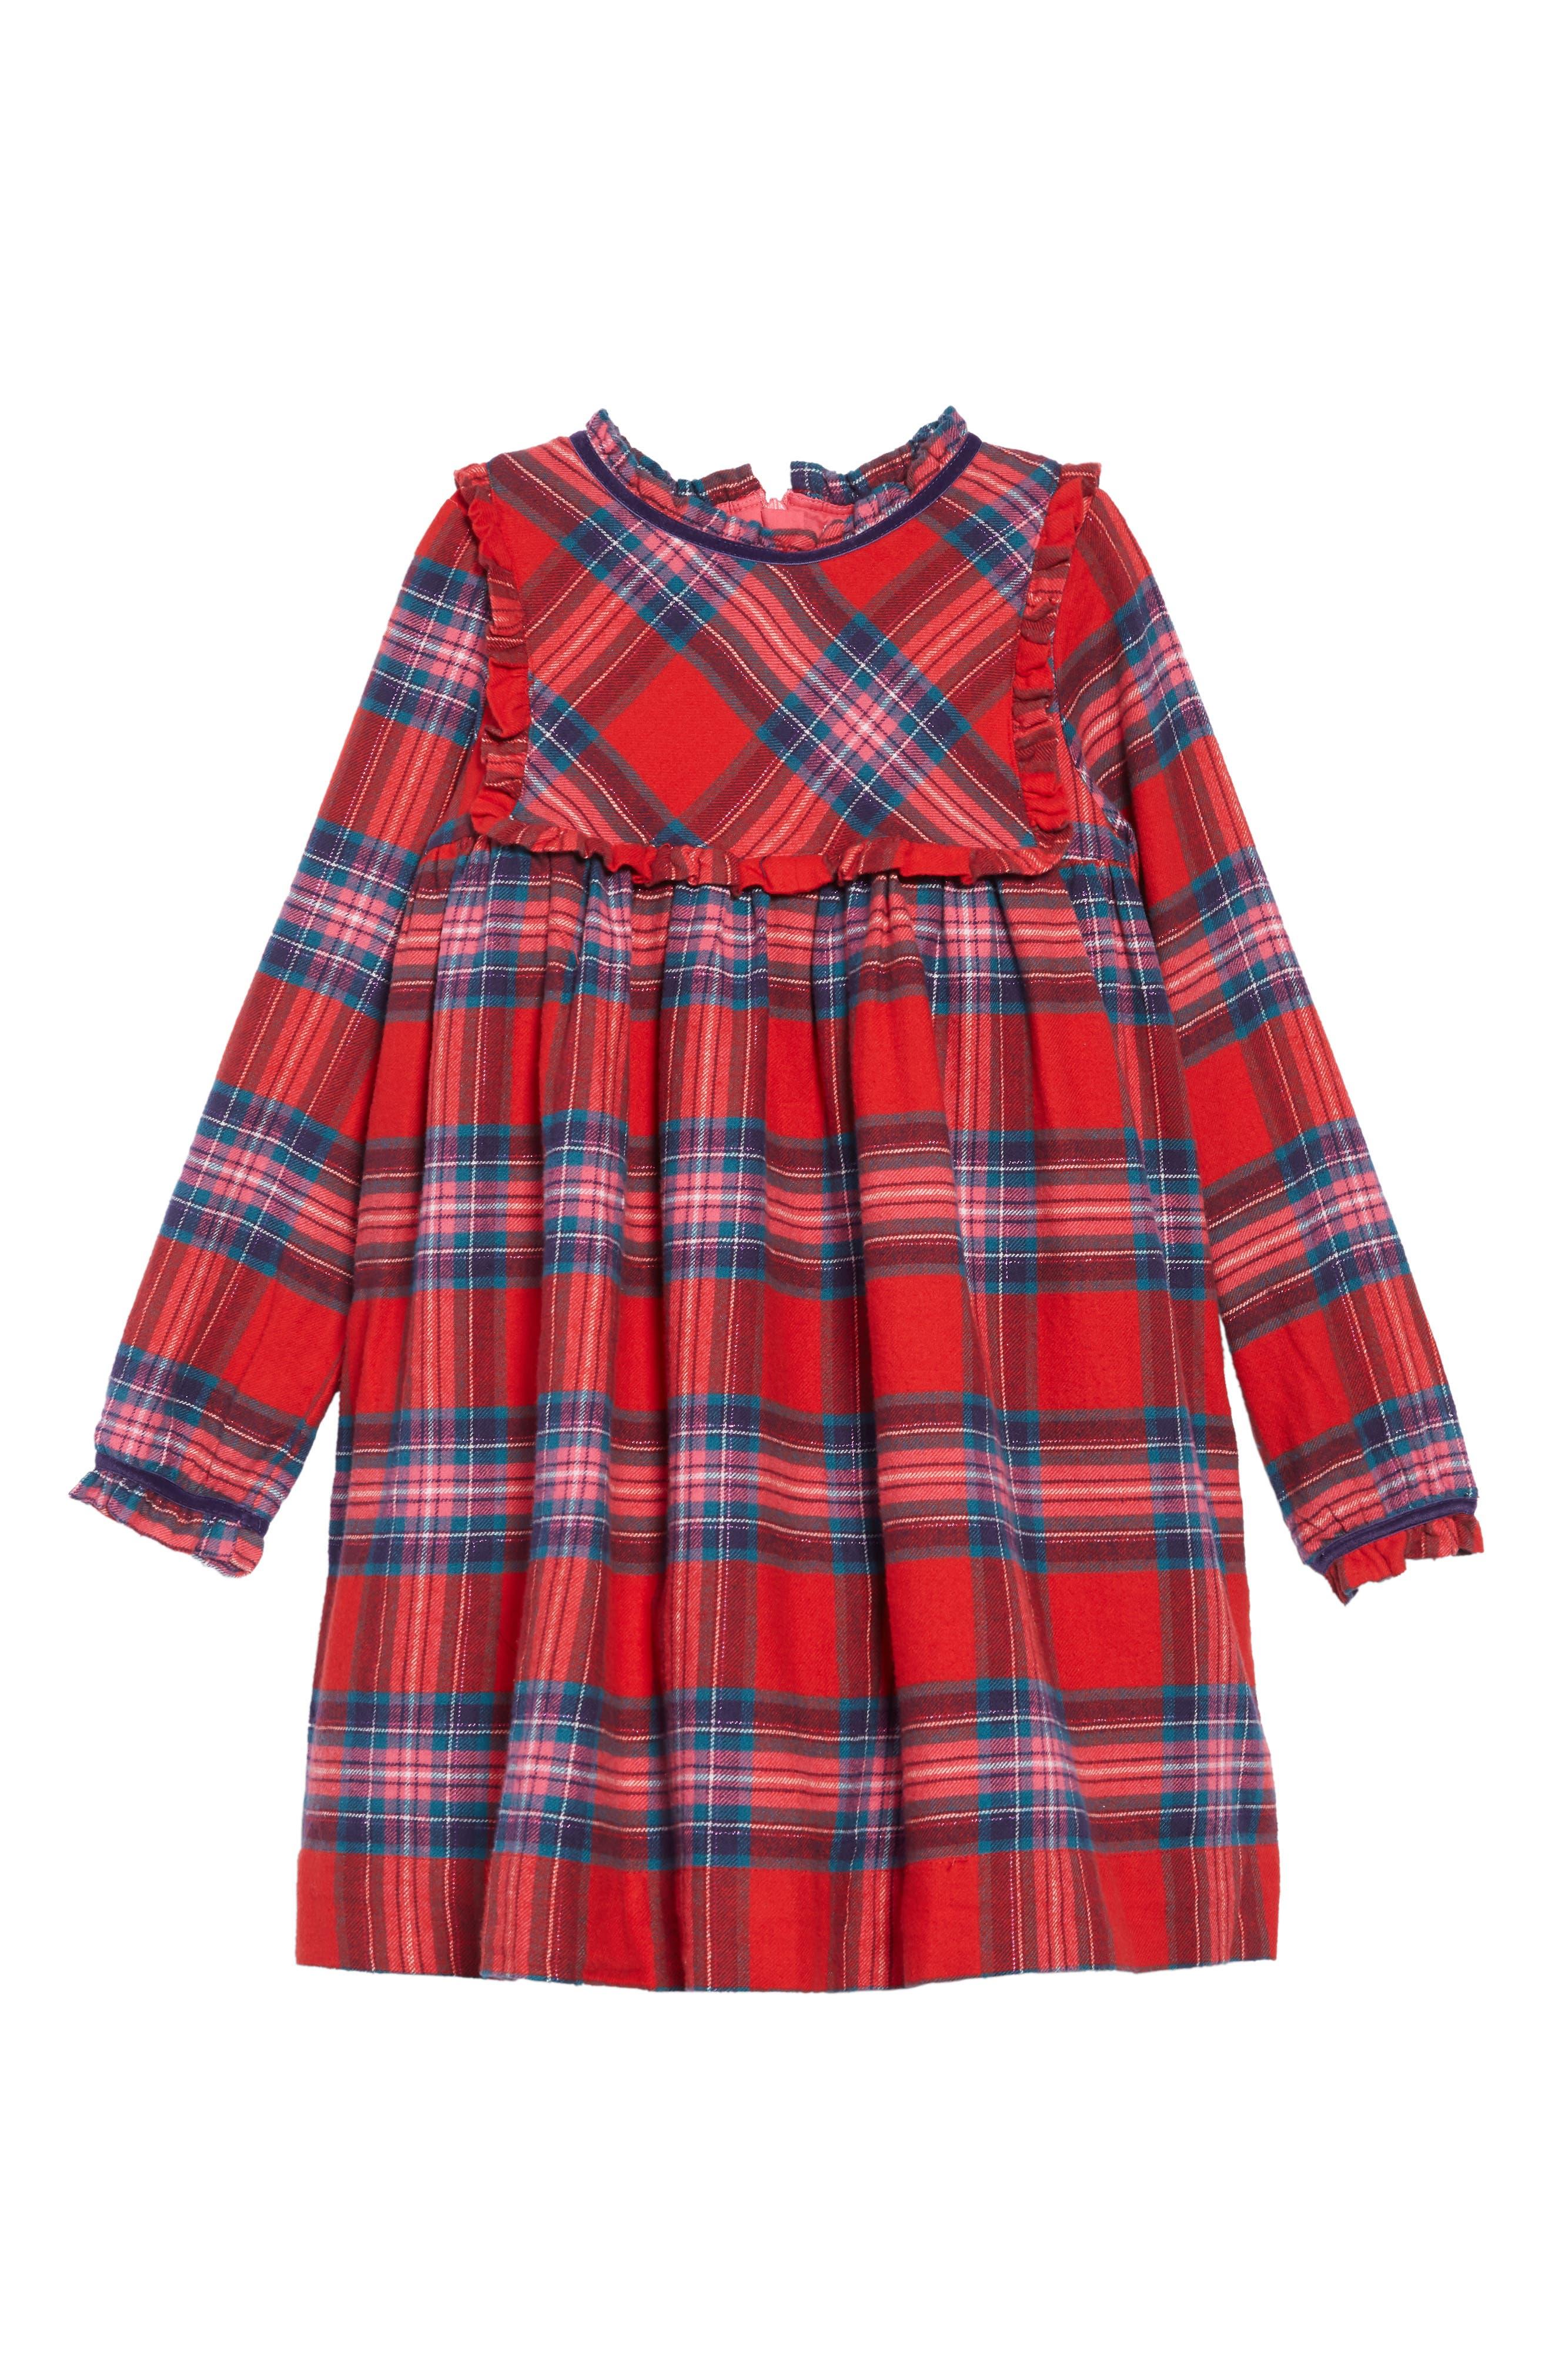 Festive Sparkle Plaid Dress,                         Main,                         color, RED ENGINE RED/ POP PINK CHECK